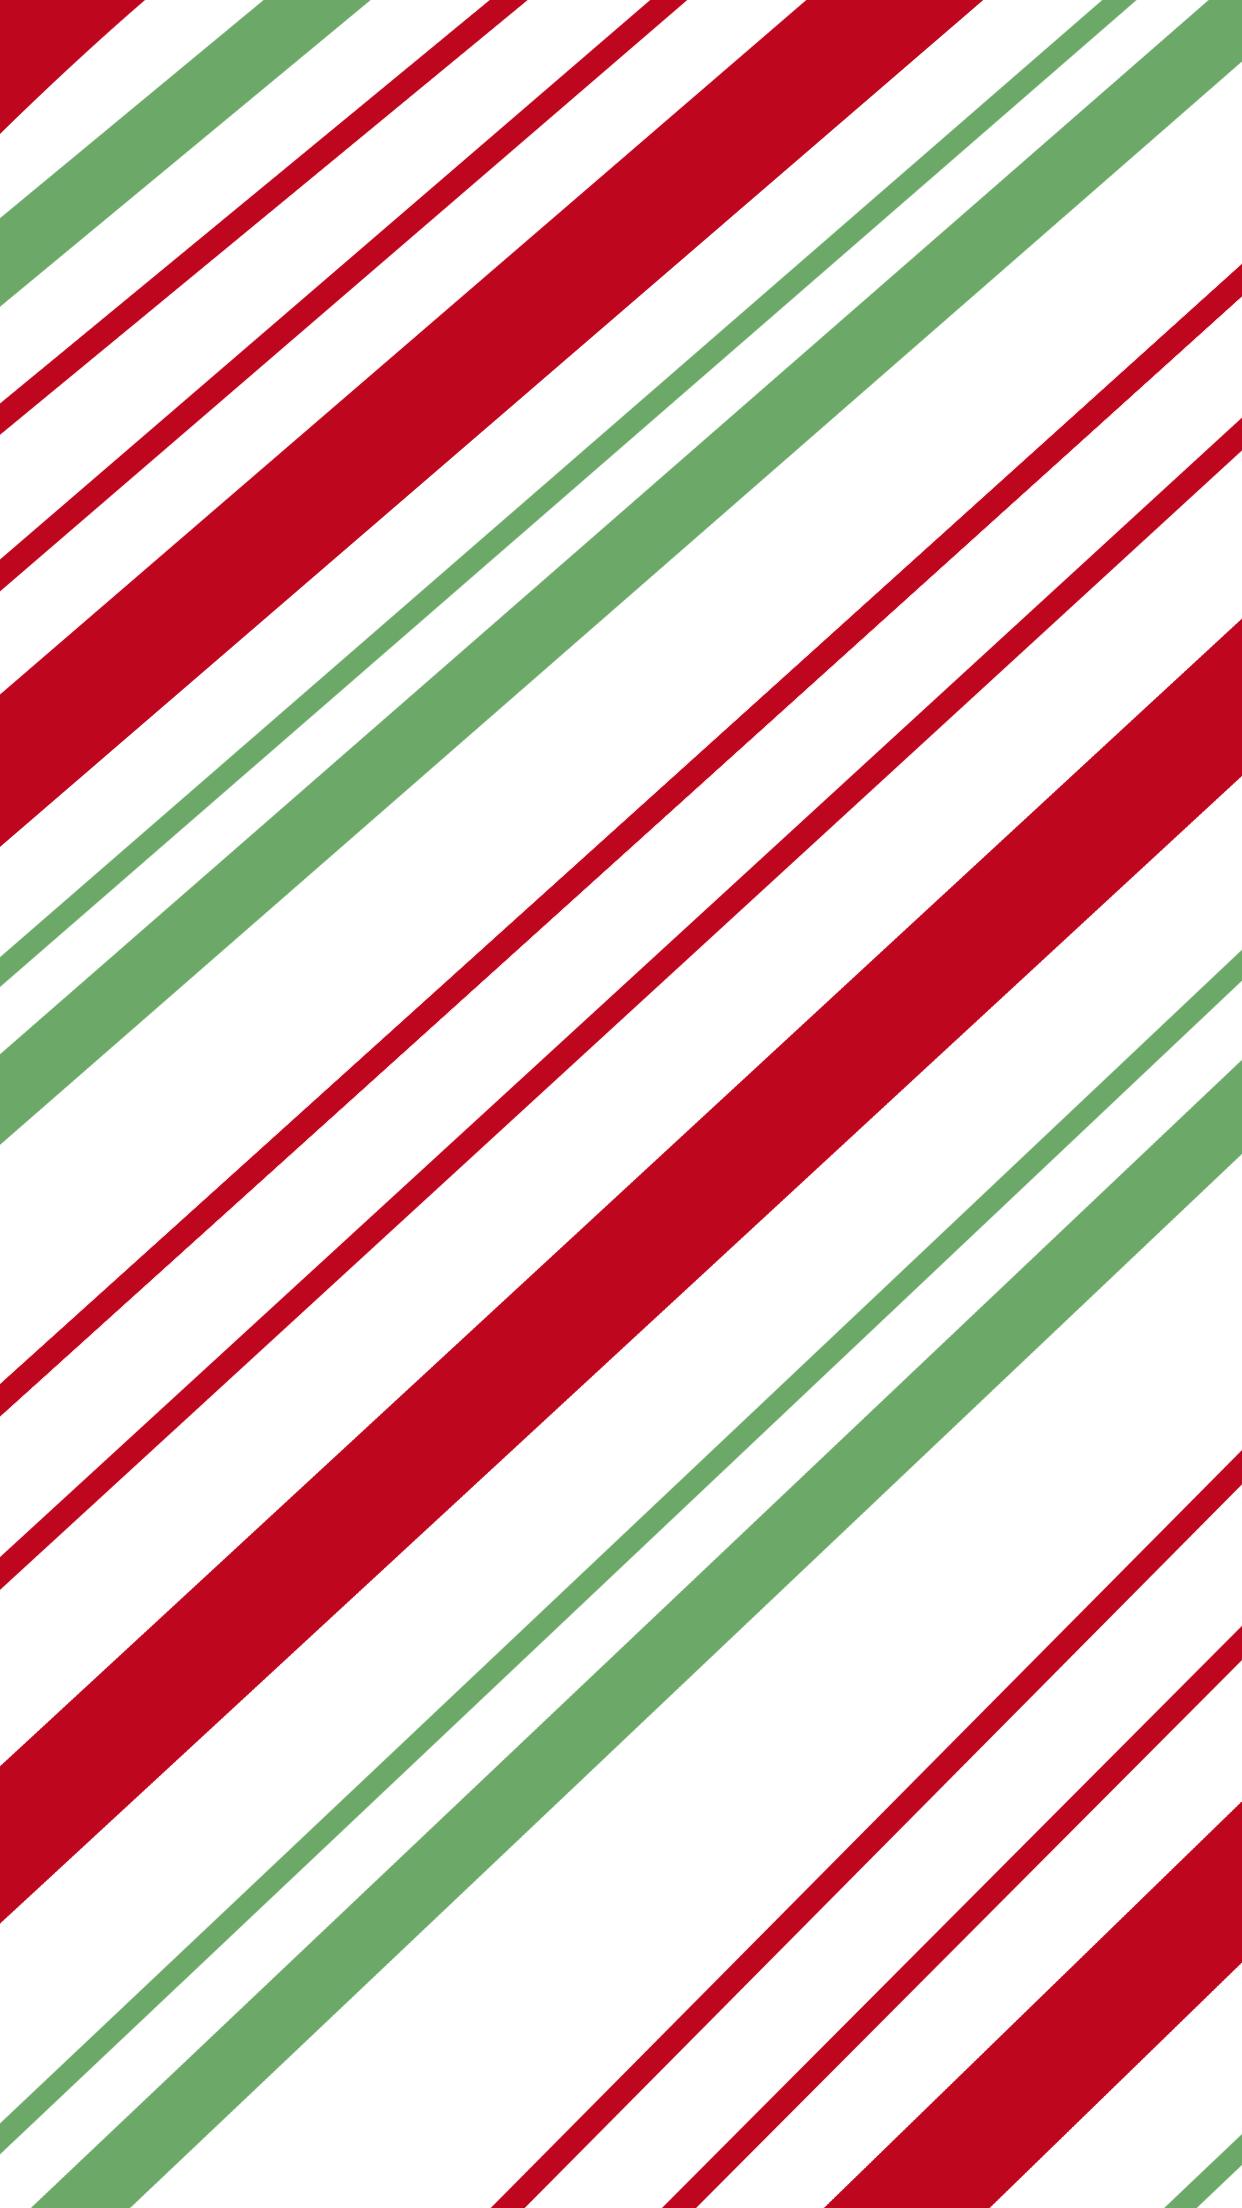 Christmas Stripe Wallpaper Ig Shopdoodlebar Striped Wallpaper Red Striped Wallpaper Christmas Phone Wallpaper